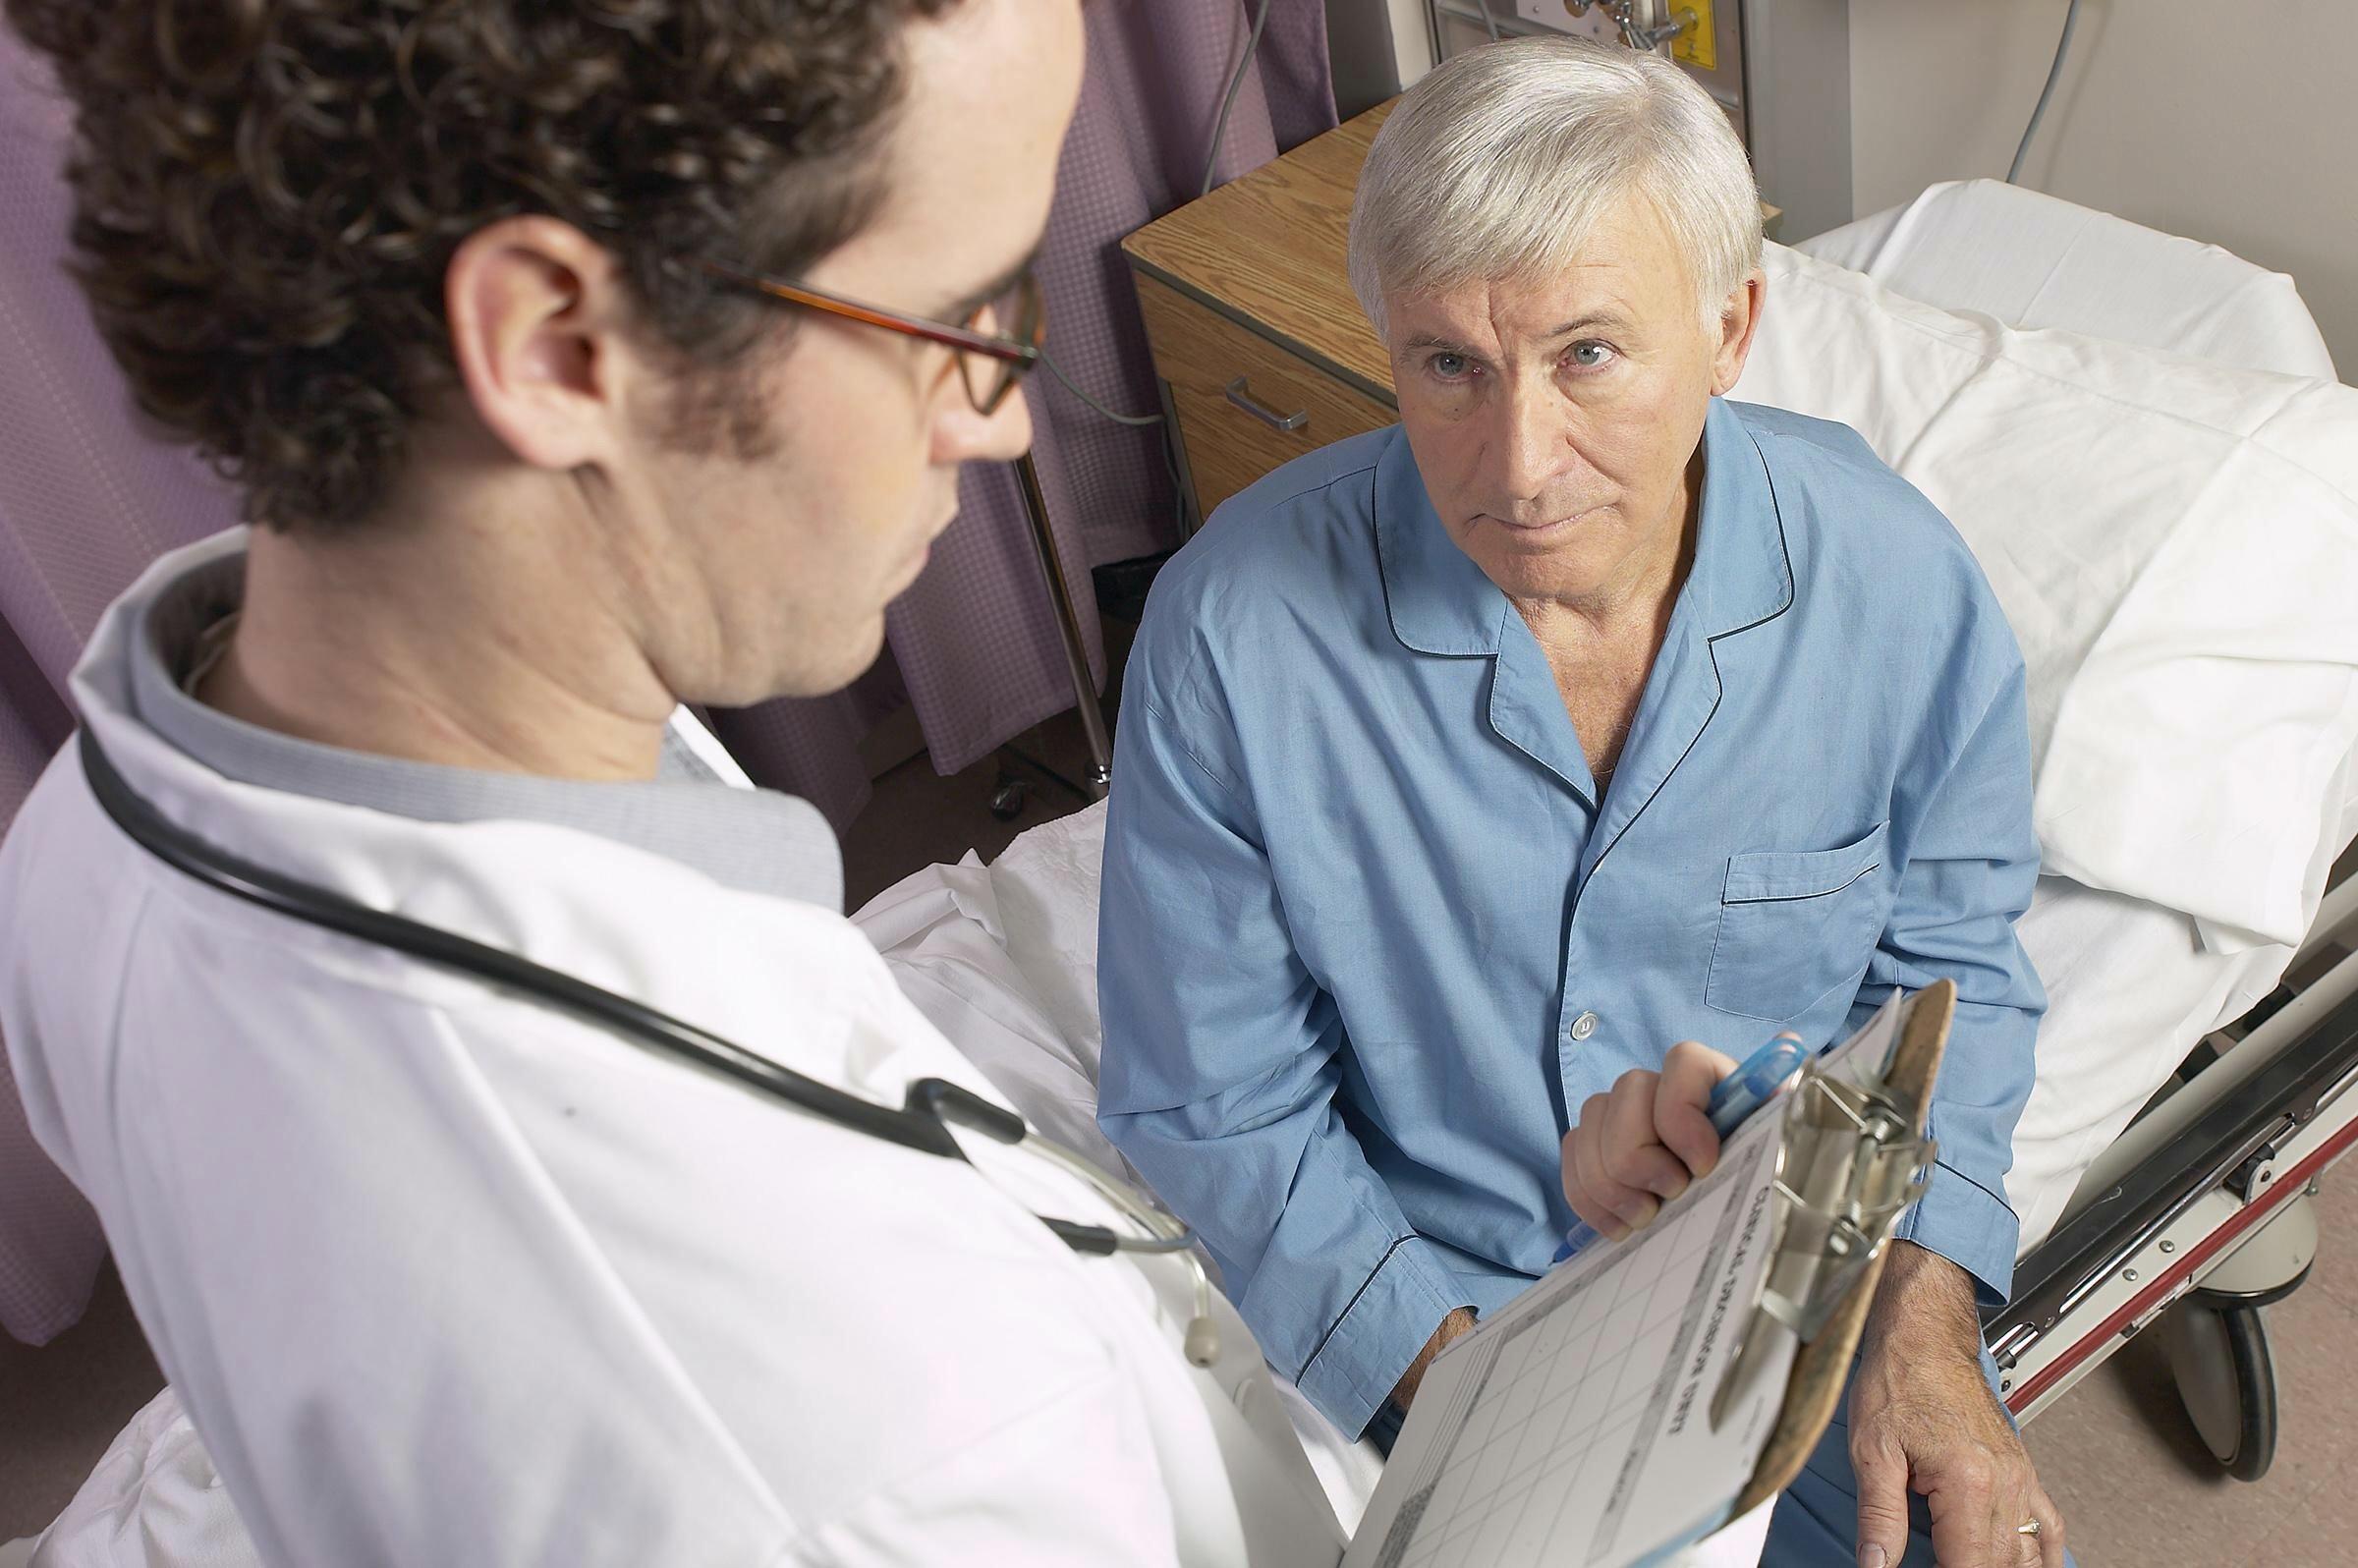 stroke patient vulnerable